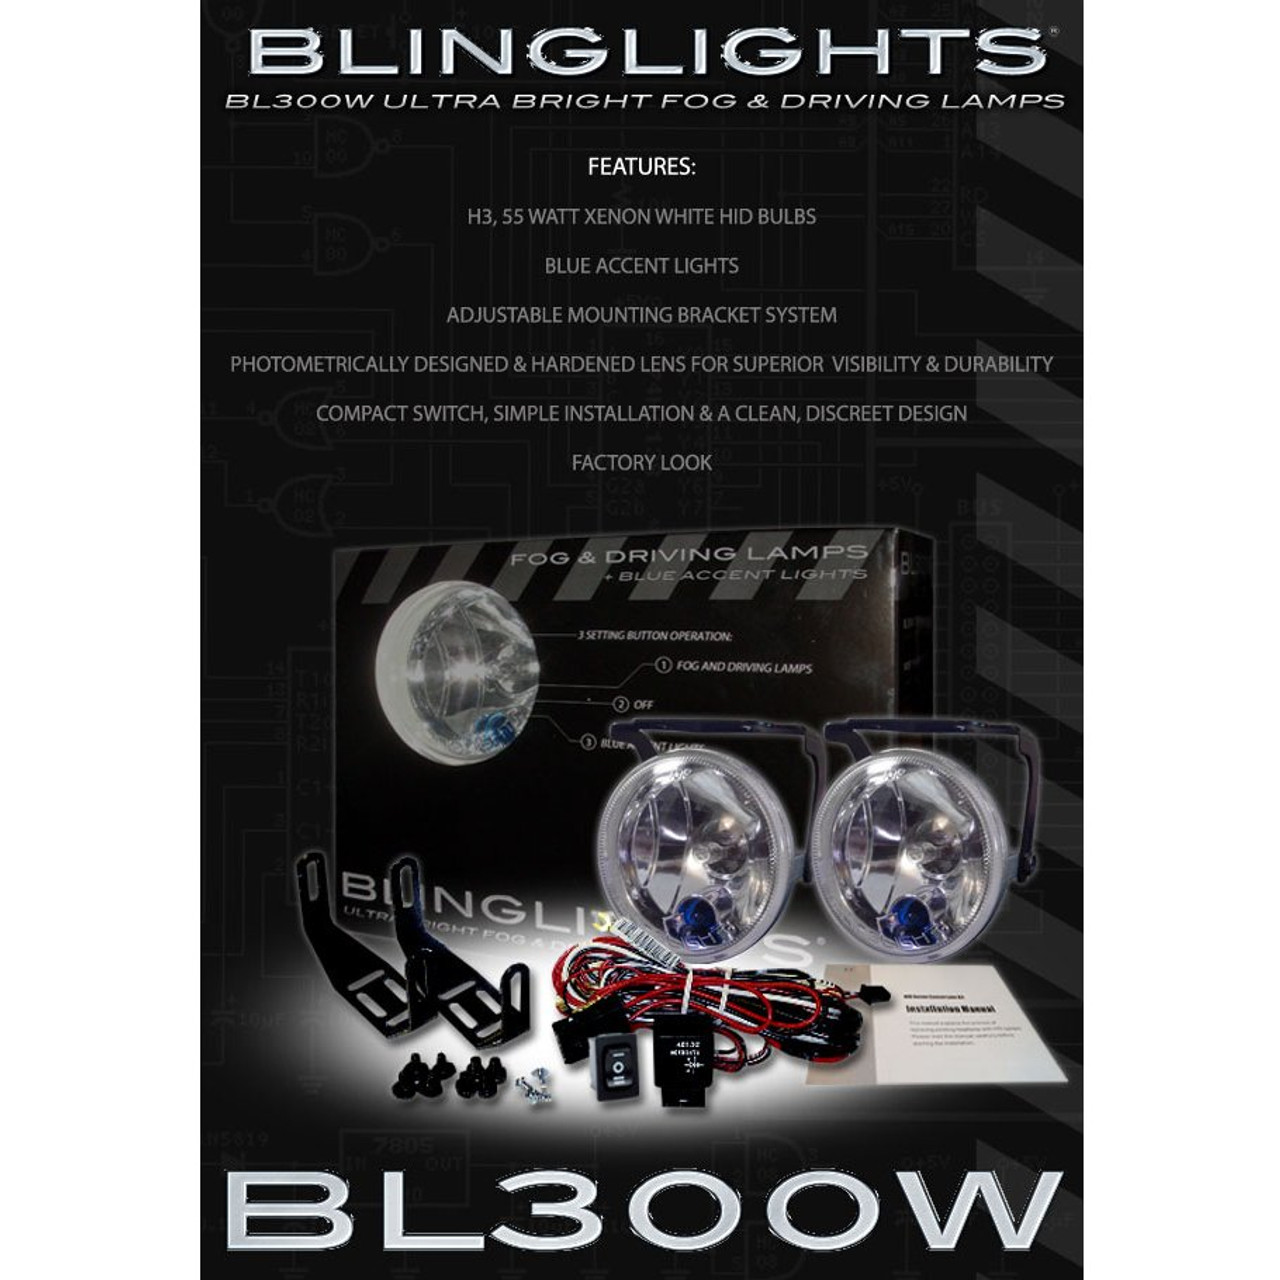 2007 2008 2009 2010 2011 2012 Opel Corsa Xenon Fog Lamps Driving Lights Foglamps Foglights Kit